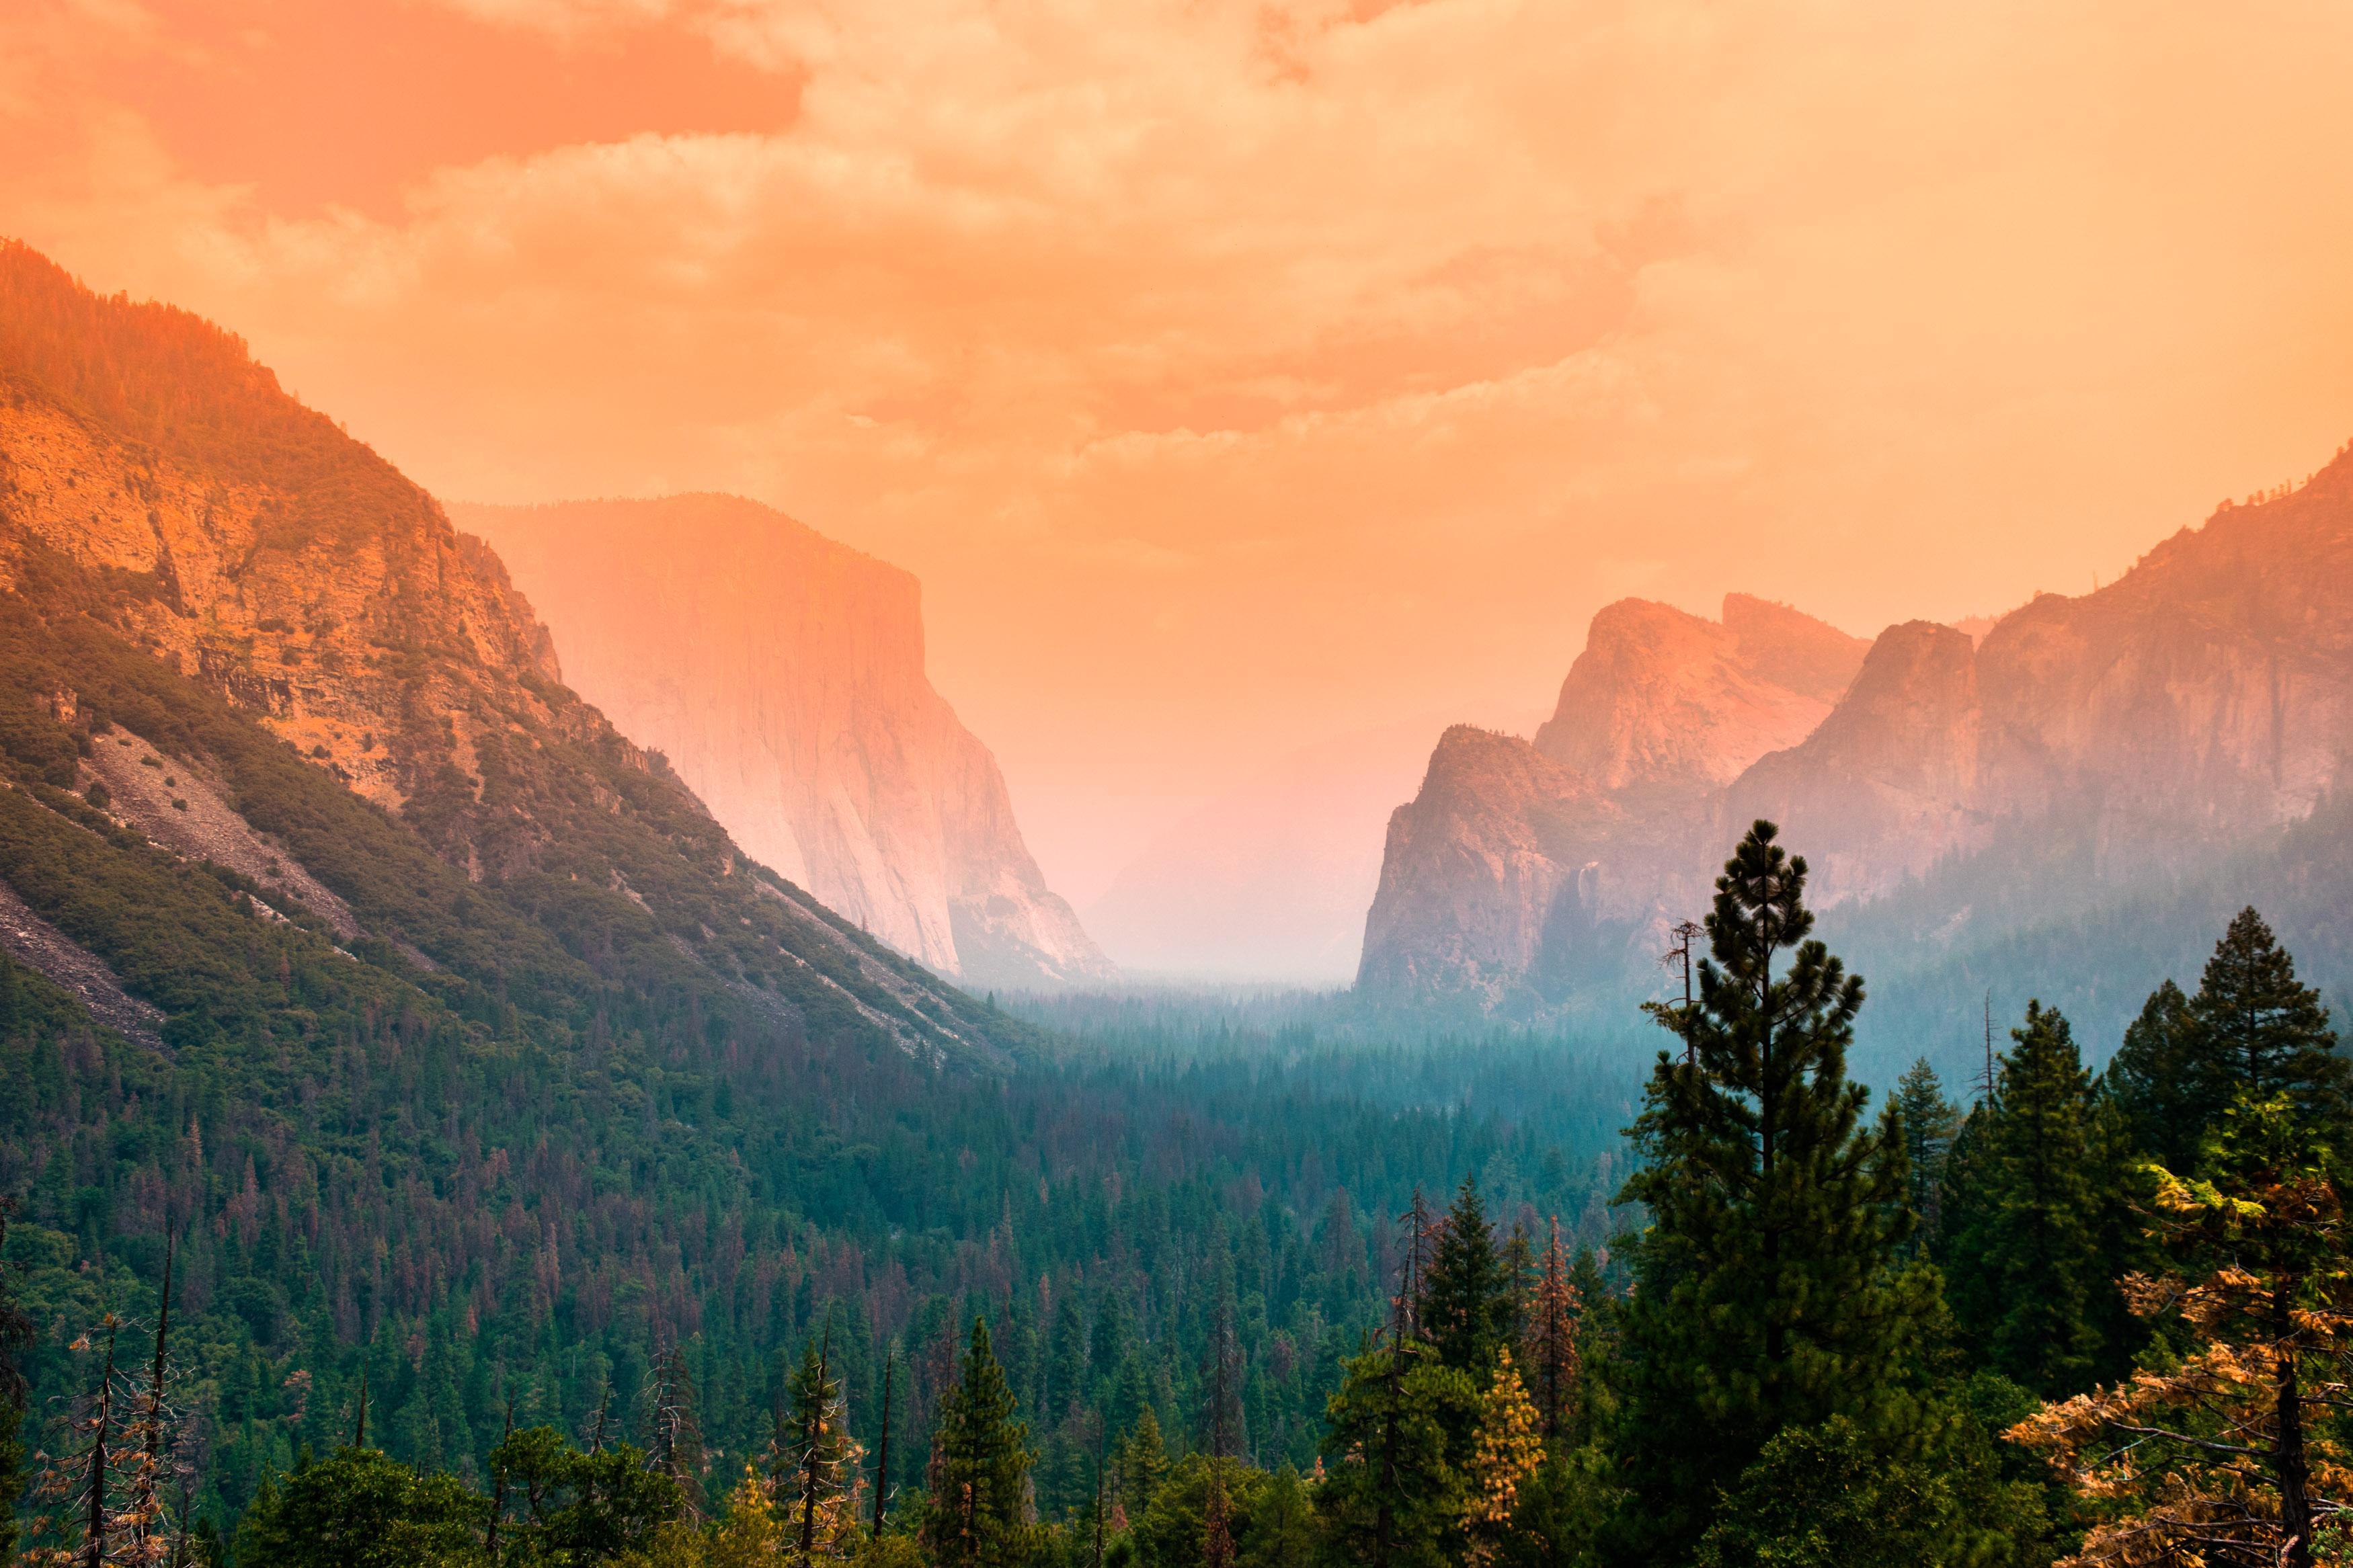 Summer in Yosemite [3500 x 2333] wallpapers 3500x2333